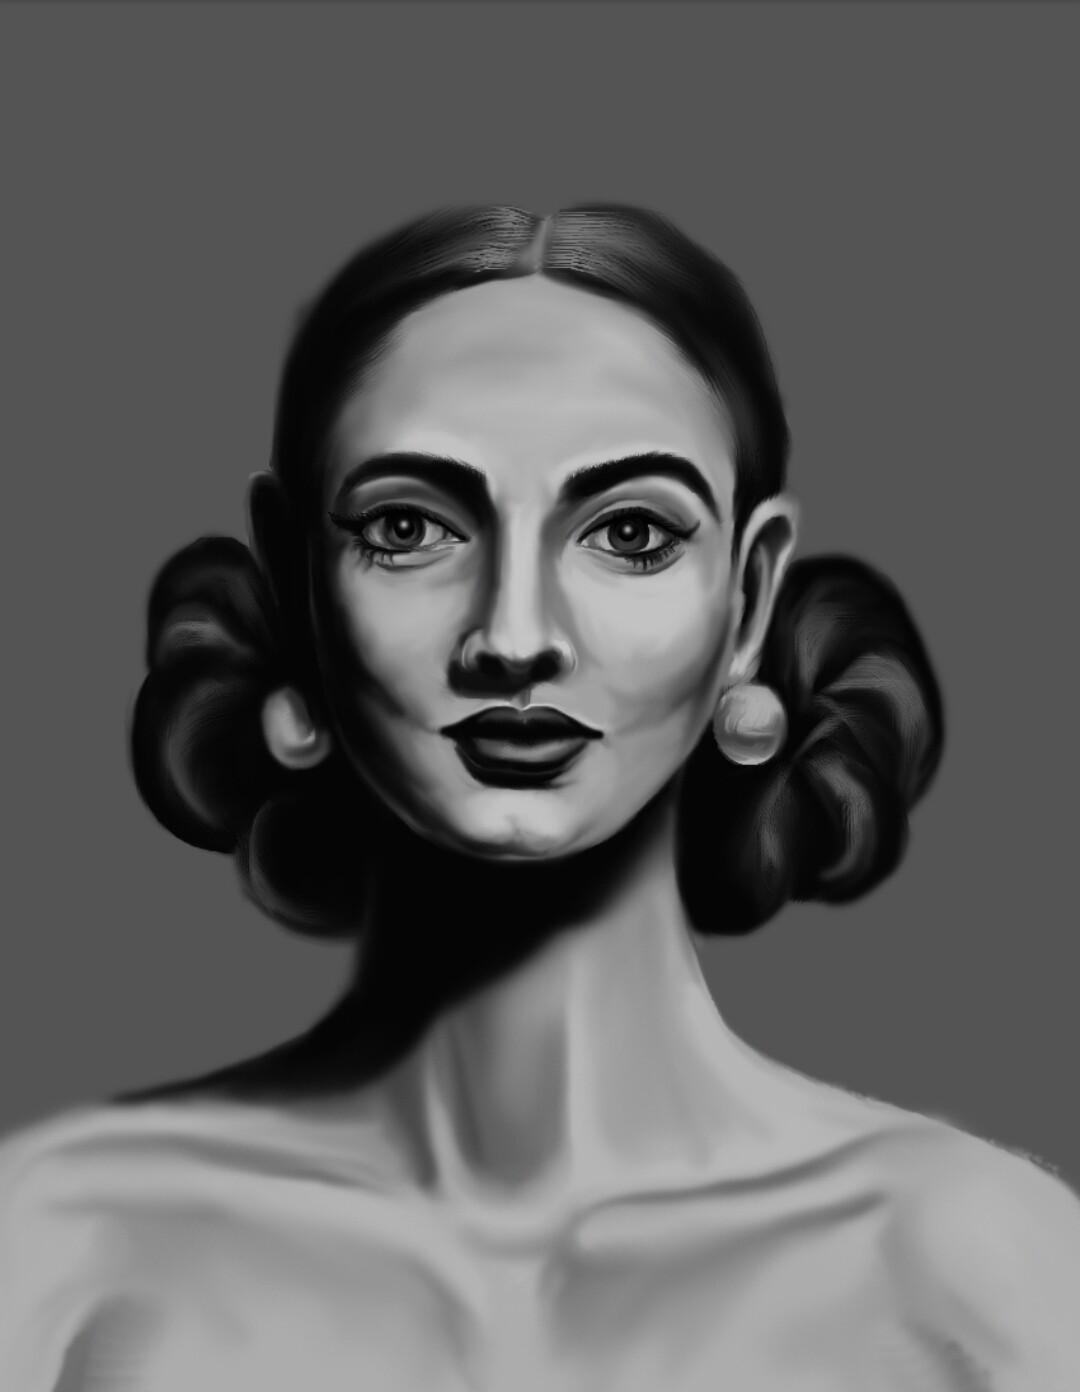 Artstation Grayscale Portrait Study Sagar Kumar